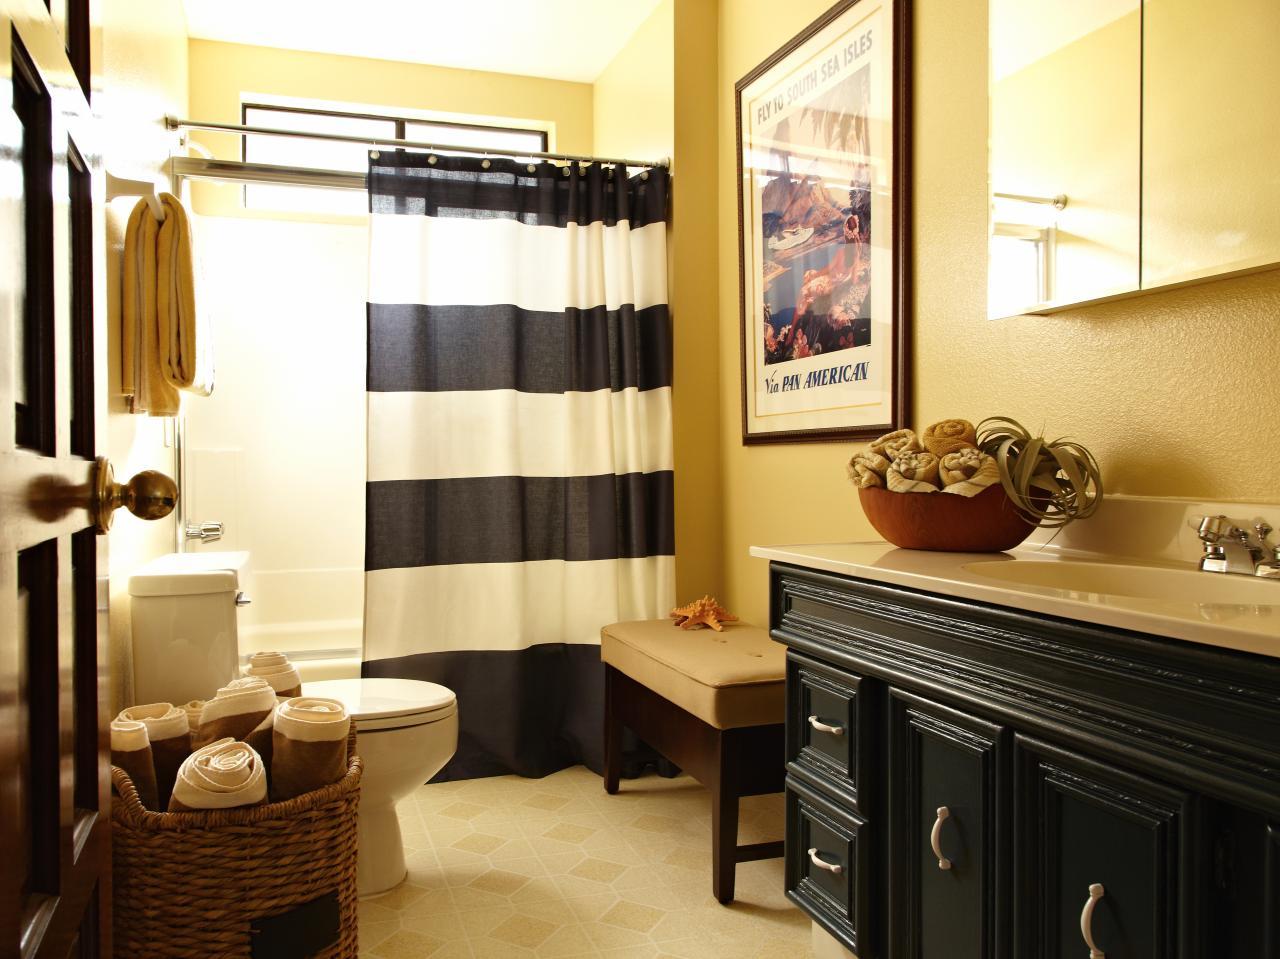 Beachy bachelor pad makeover diy home decor and for Black and yellow bathroom decor